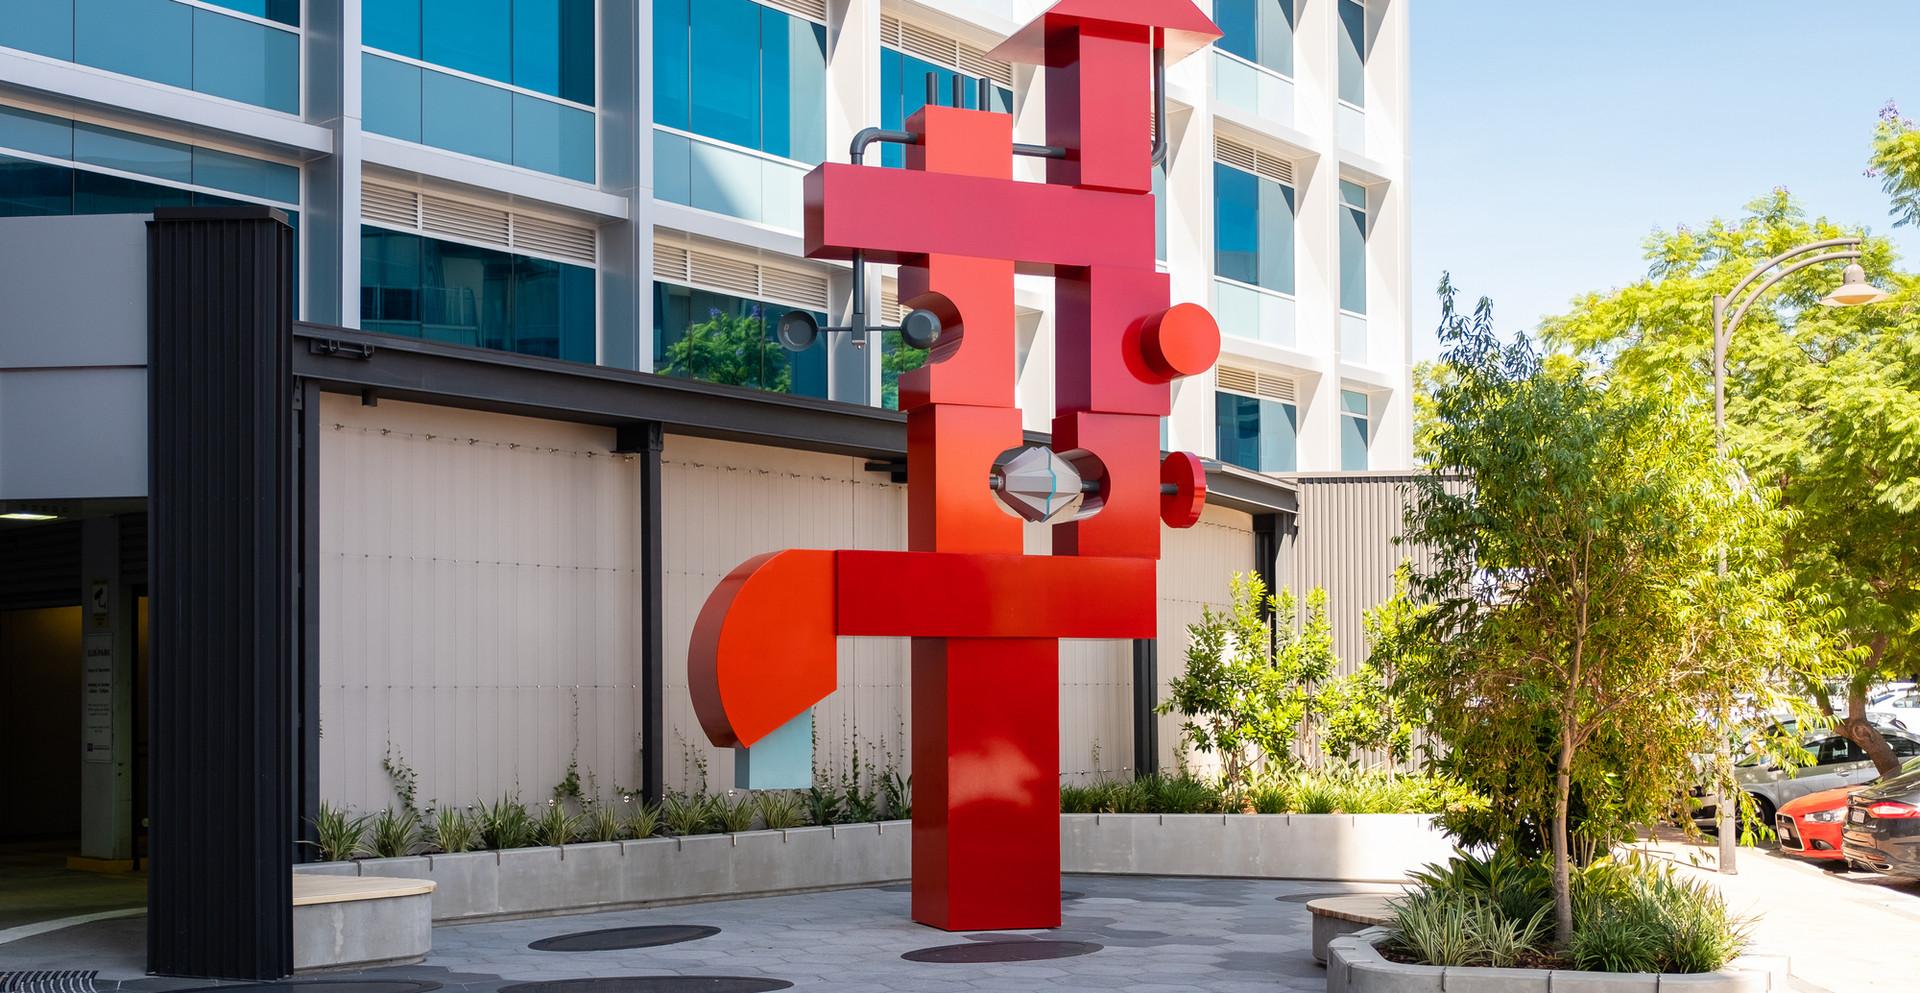 Public artwork – Subiaco (Collaboration with Paul Caporn)